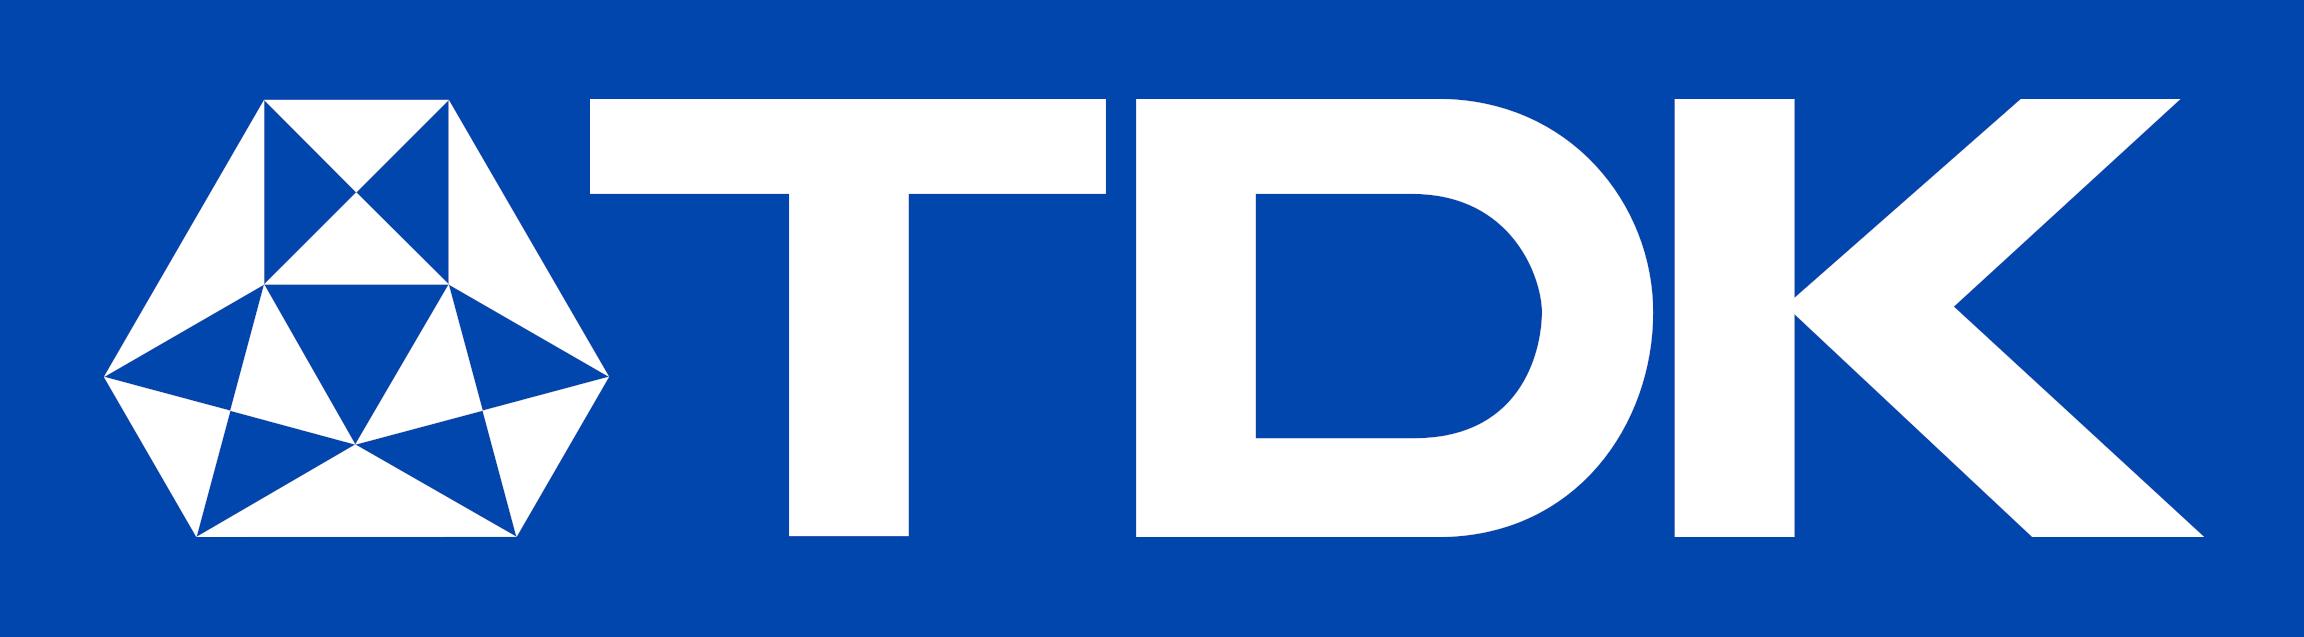 TDK logó